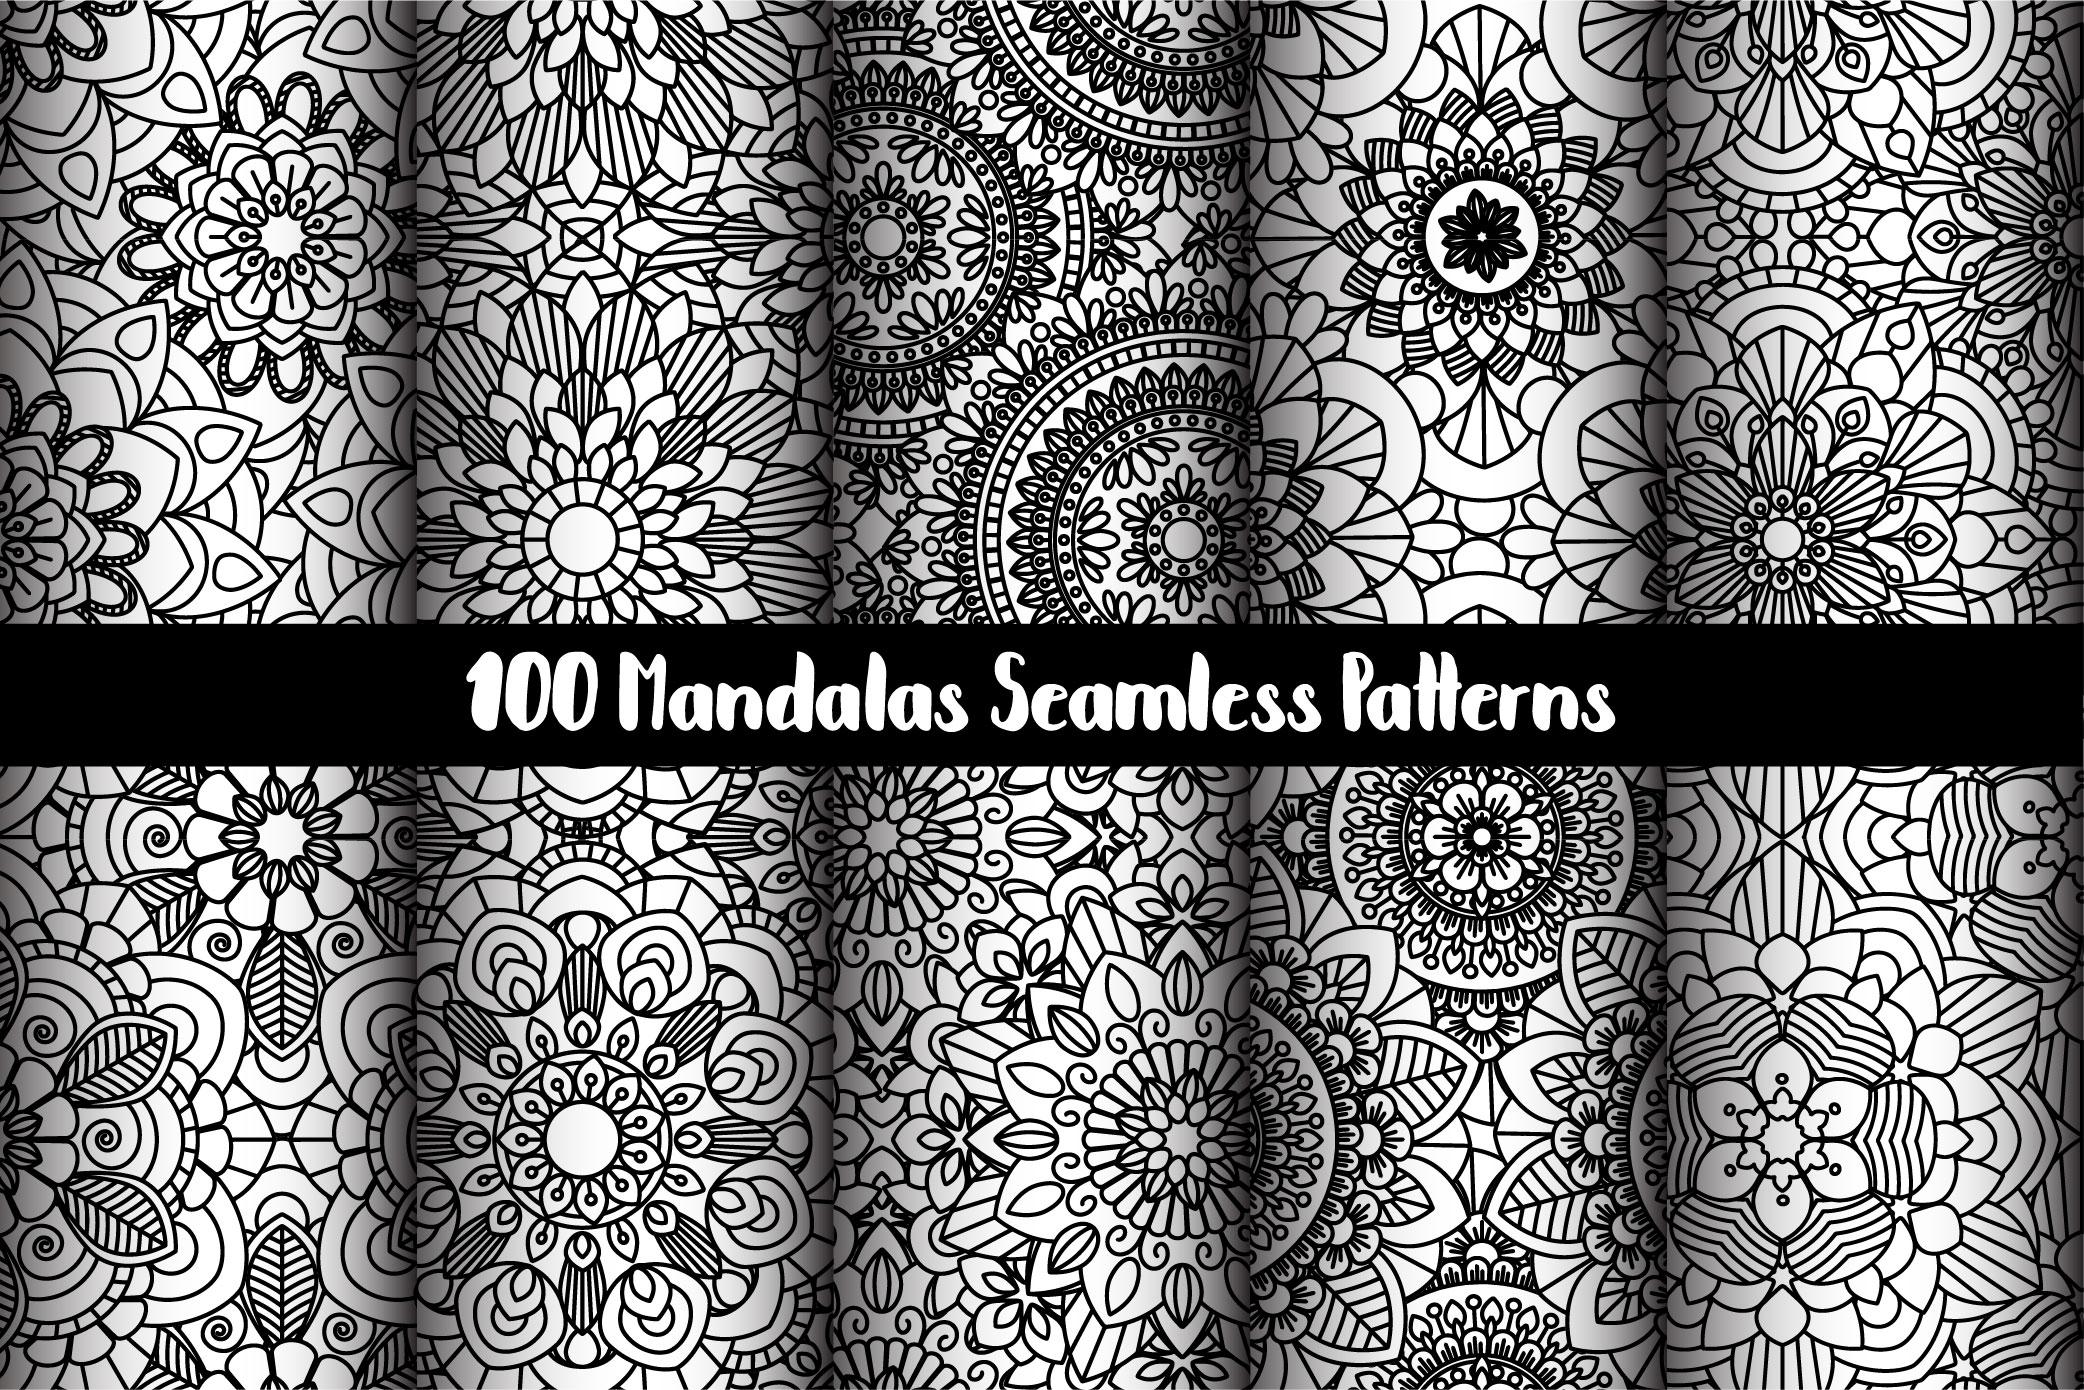 100 Mandalas Seamless Patterns example image 15